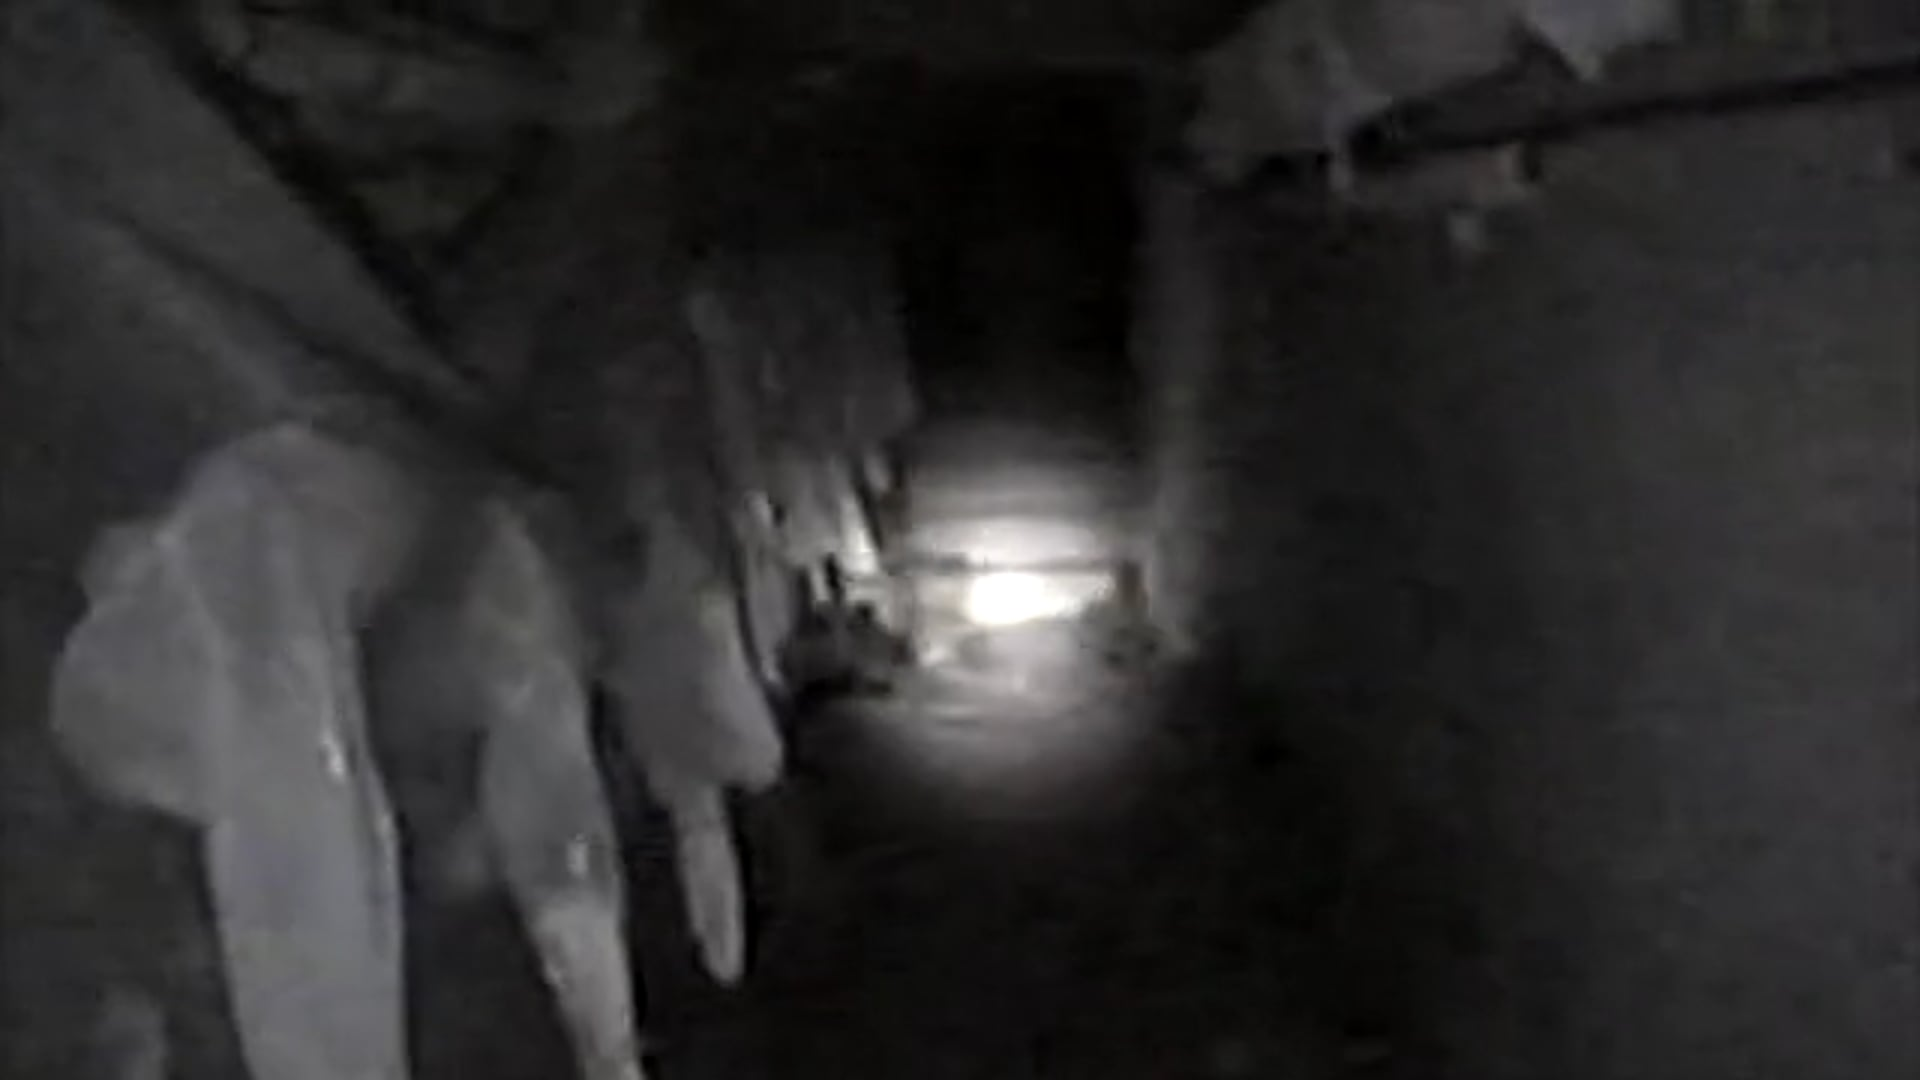 Danvers State Hospital tunnel exploration 2001